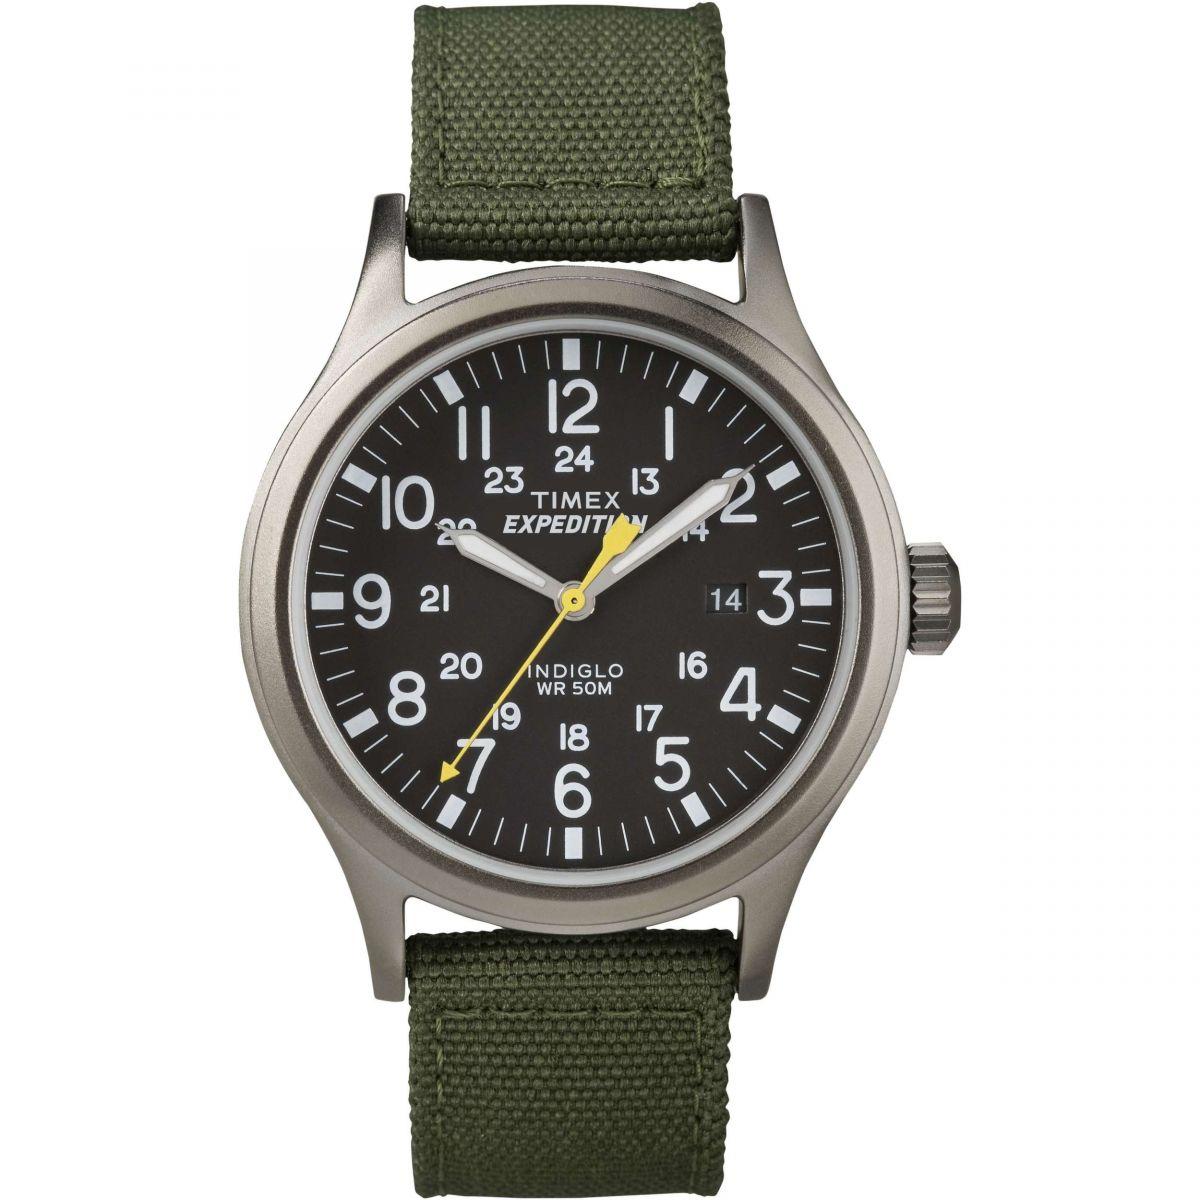 gents timex expedition watch t49961 watchshopcom�